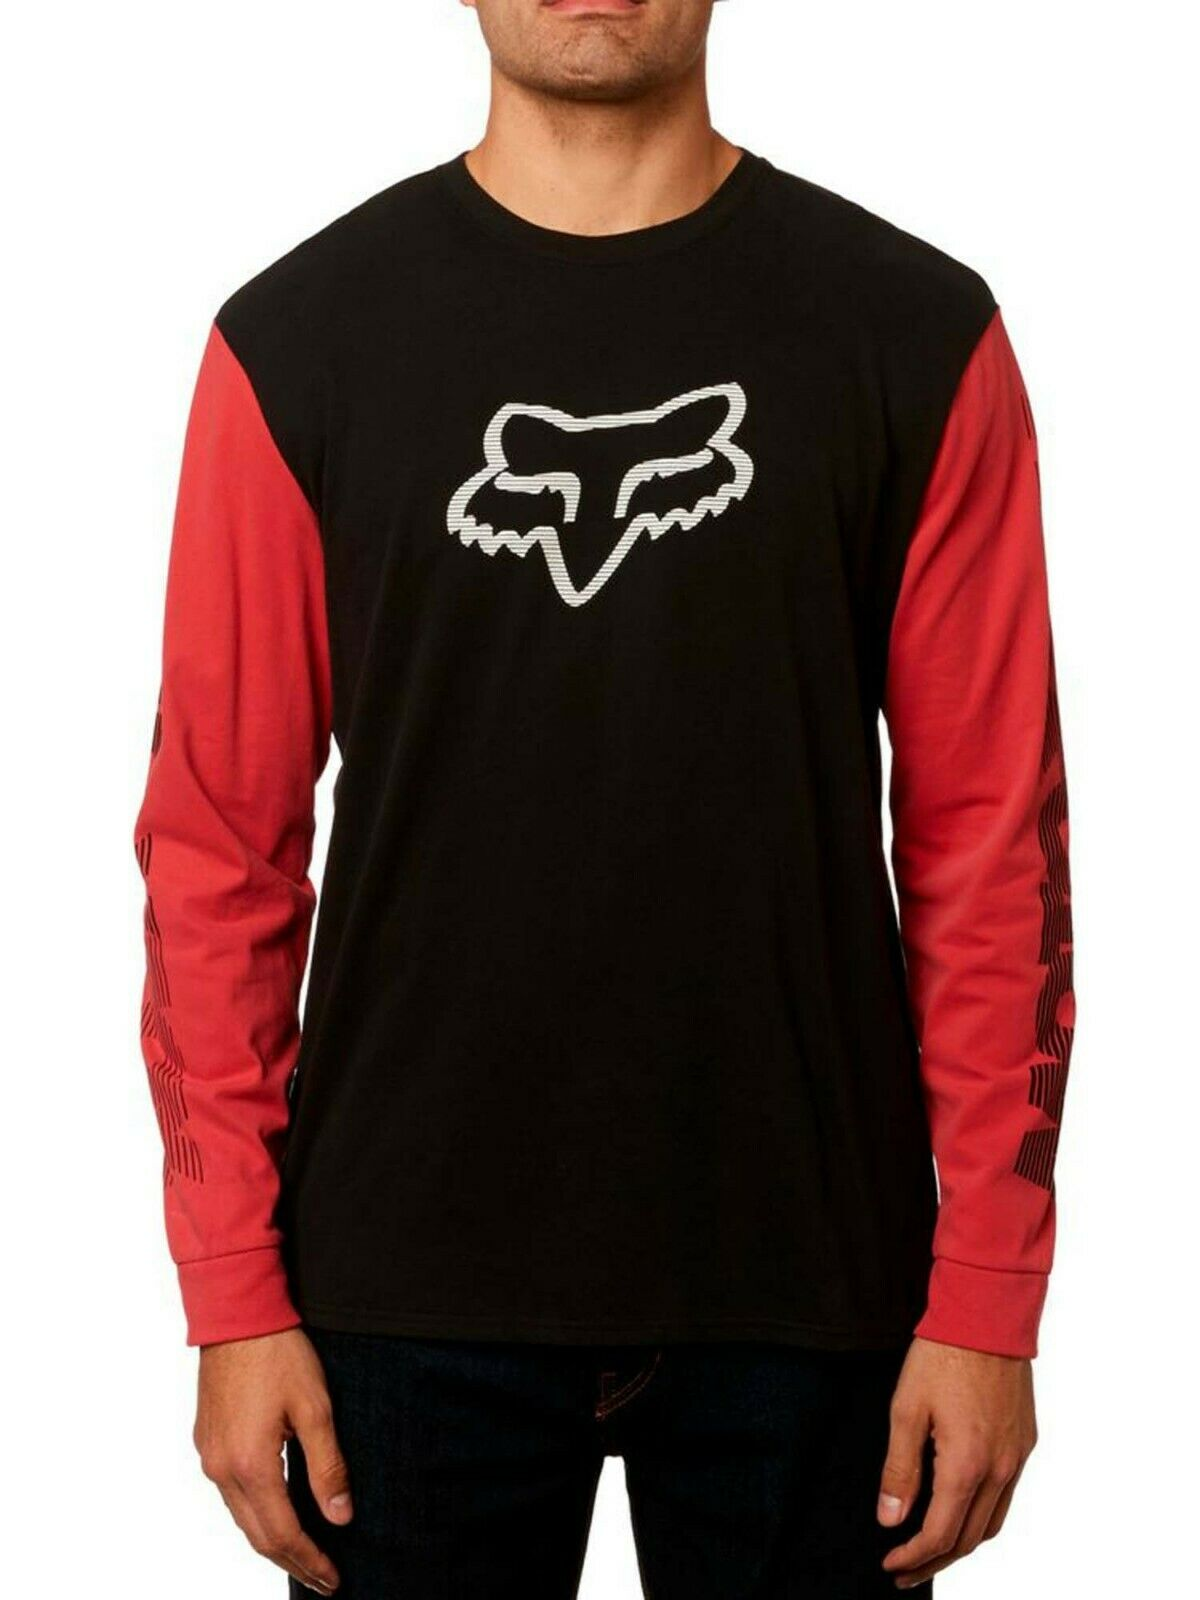 Fox Racing Men's Victory Long Sleeve Airline Tee with Foxhead Motocross Logo